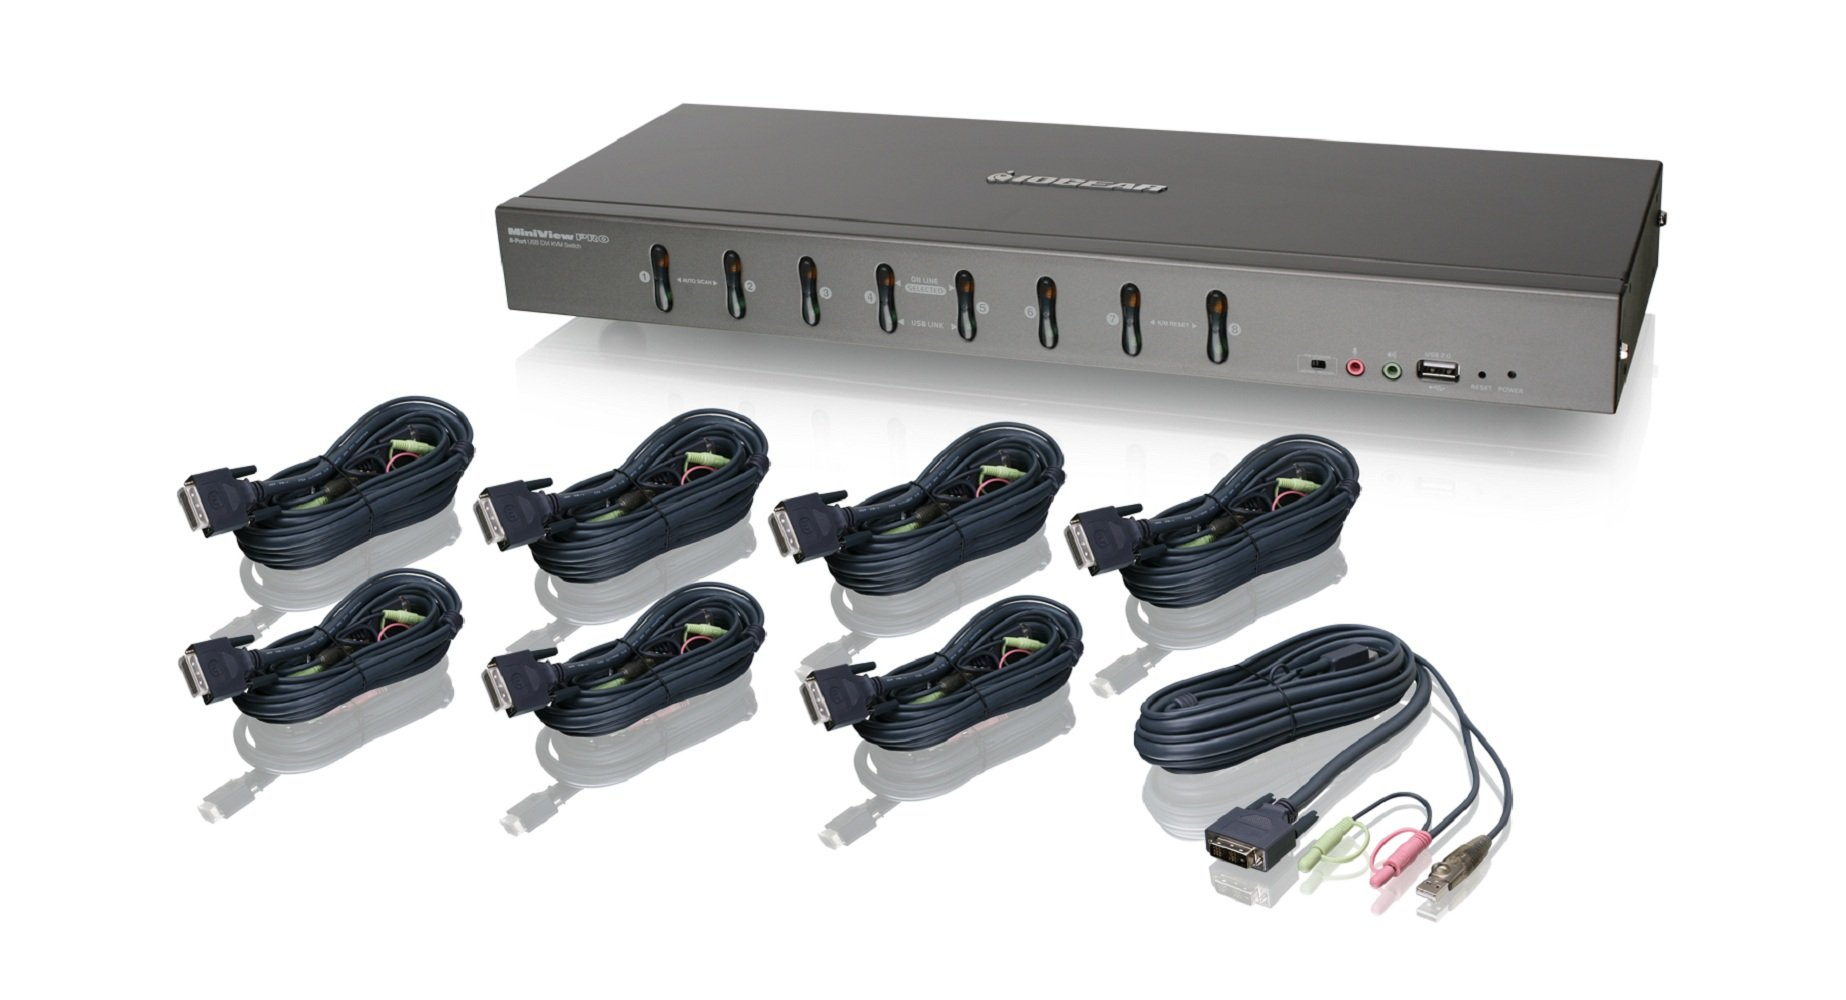 IOGEAR 8-Port Rackmount DVI and VGA KVMP Switch with 8-DVI-D USB KVM Cables, GCS1108KIT1